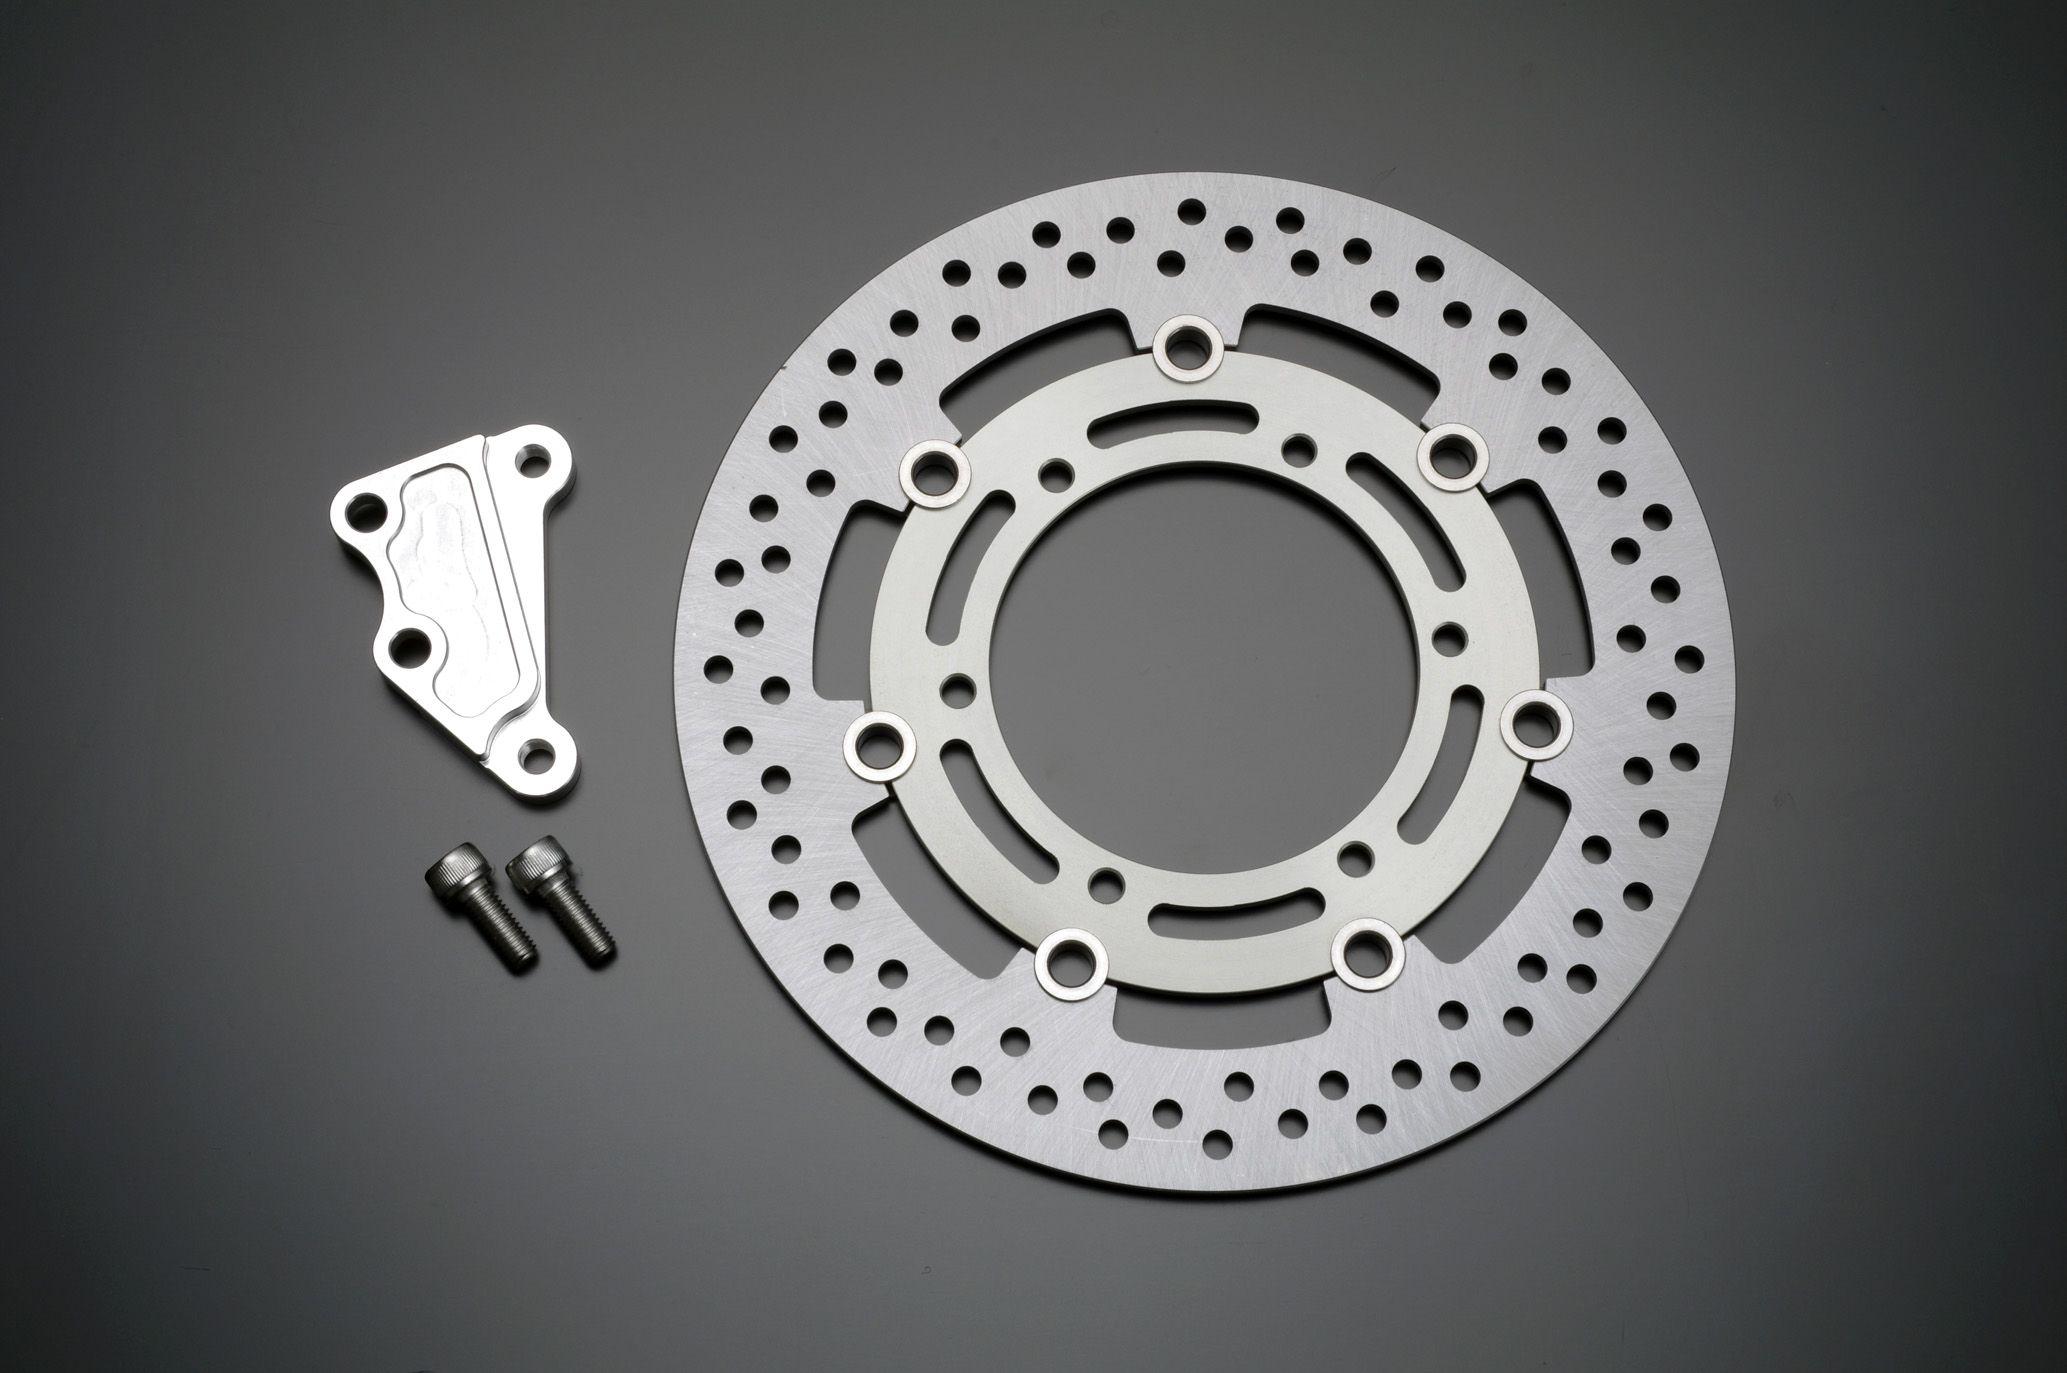 【GRONDEMENT】Φ285 煞車碟盤套件 Brembo用 (銀色) (40mm Pitch) - 「Webike-摩托百貨」